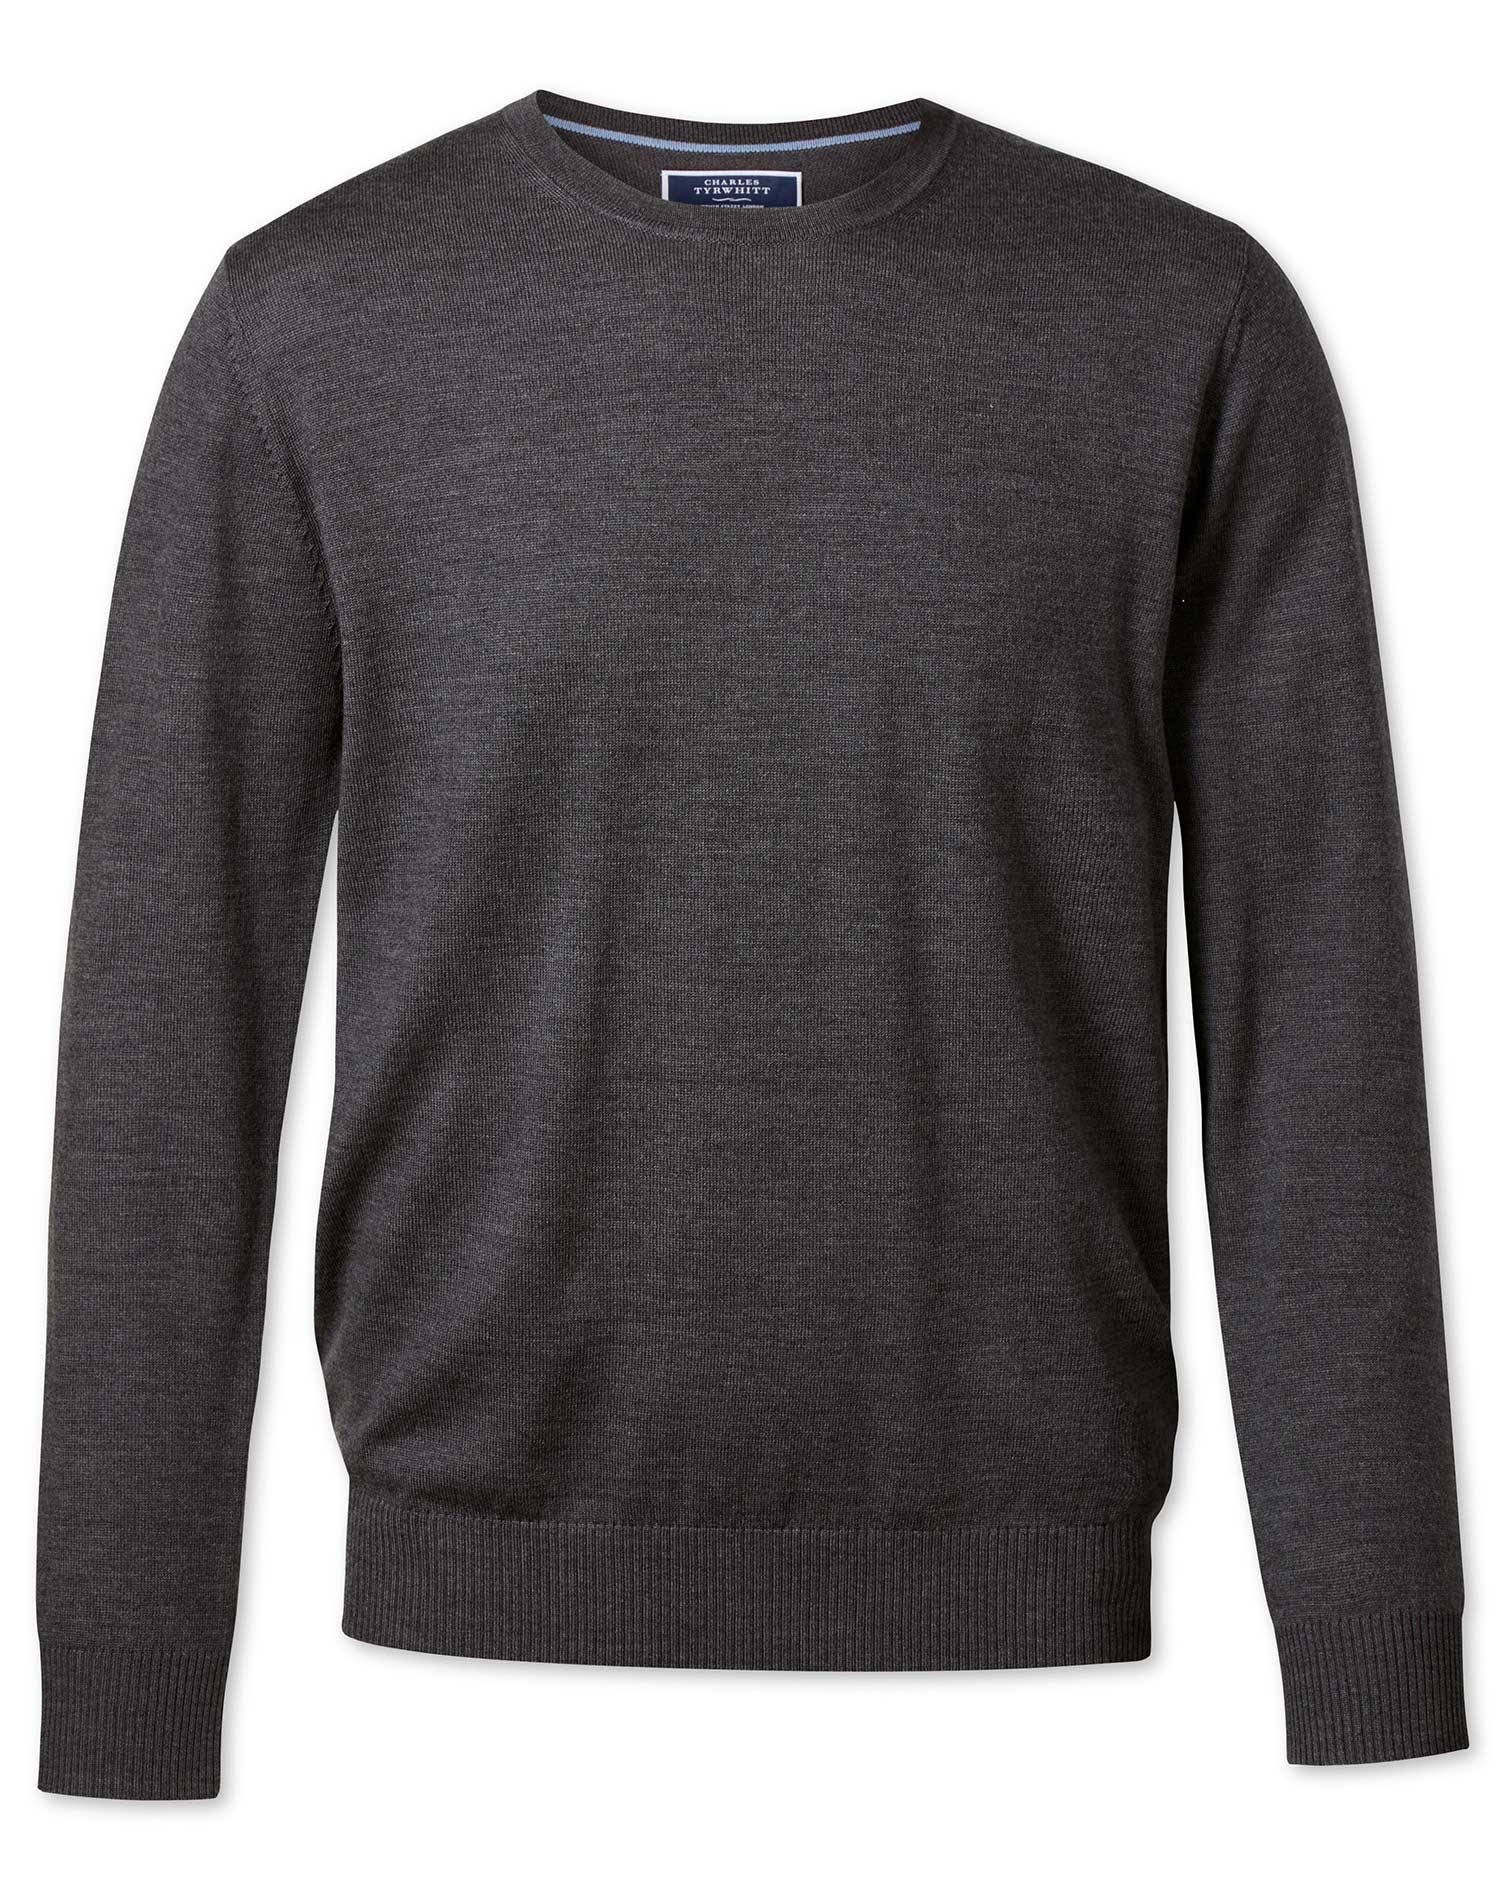 Charcoal Merino Wool Crew Neck Jumper Size XS by Charles Tyrwhitt